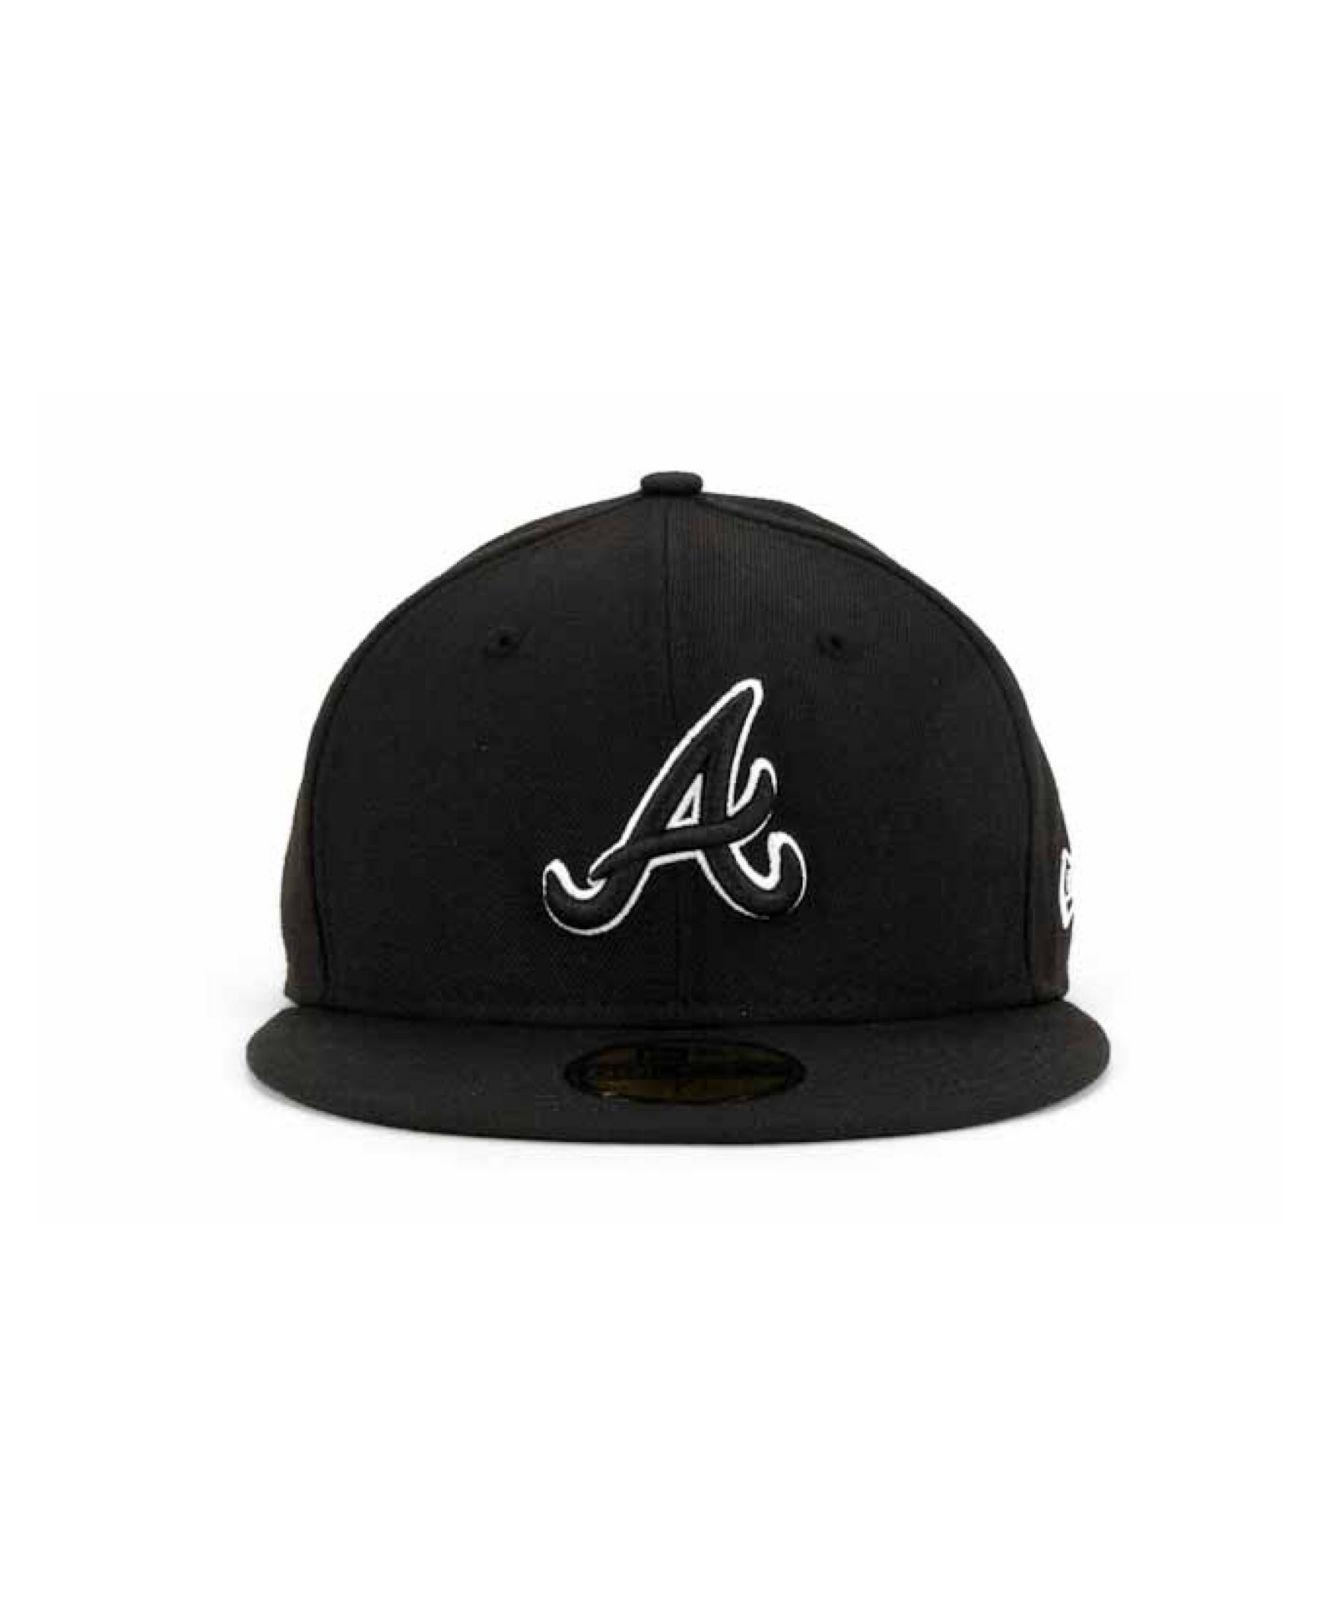 size 40 56e83 bc2fe ... czech lyst ktz atlanta braves black and white fashion 59fifty cap in  black for men 37963